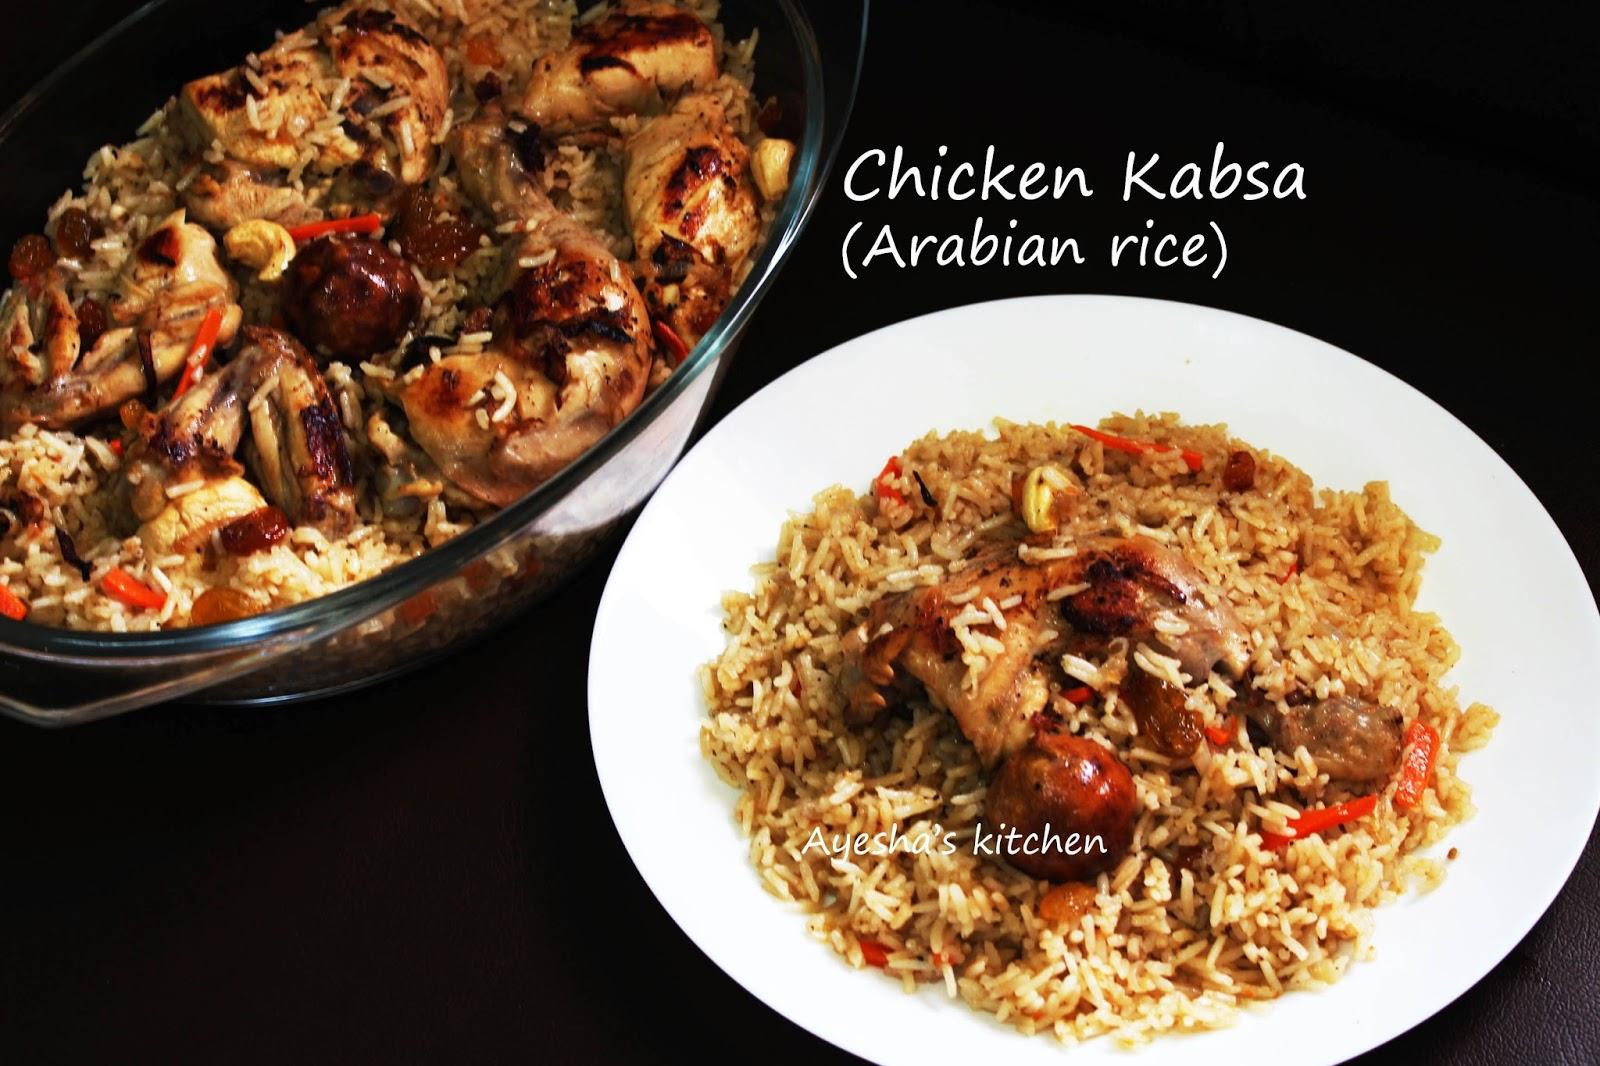 Kabsa recipe chicken kabsa arab rice recipe chicken kabsa recipe rice recipes forumfinder Gallery